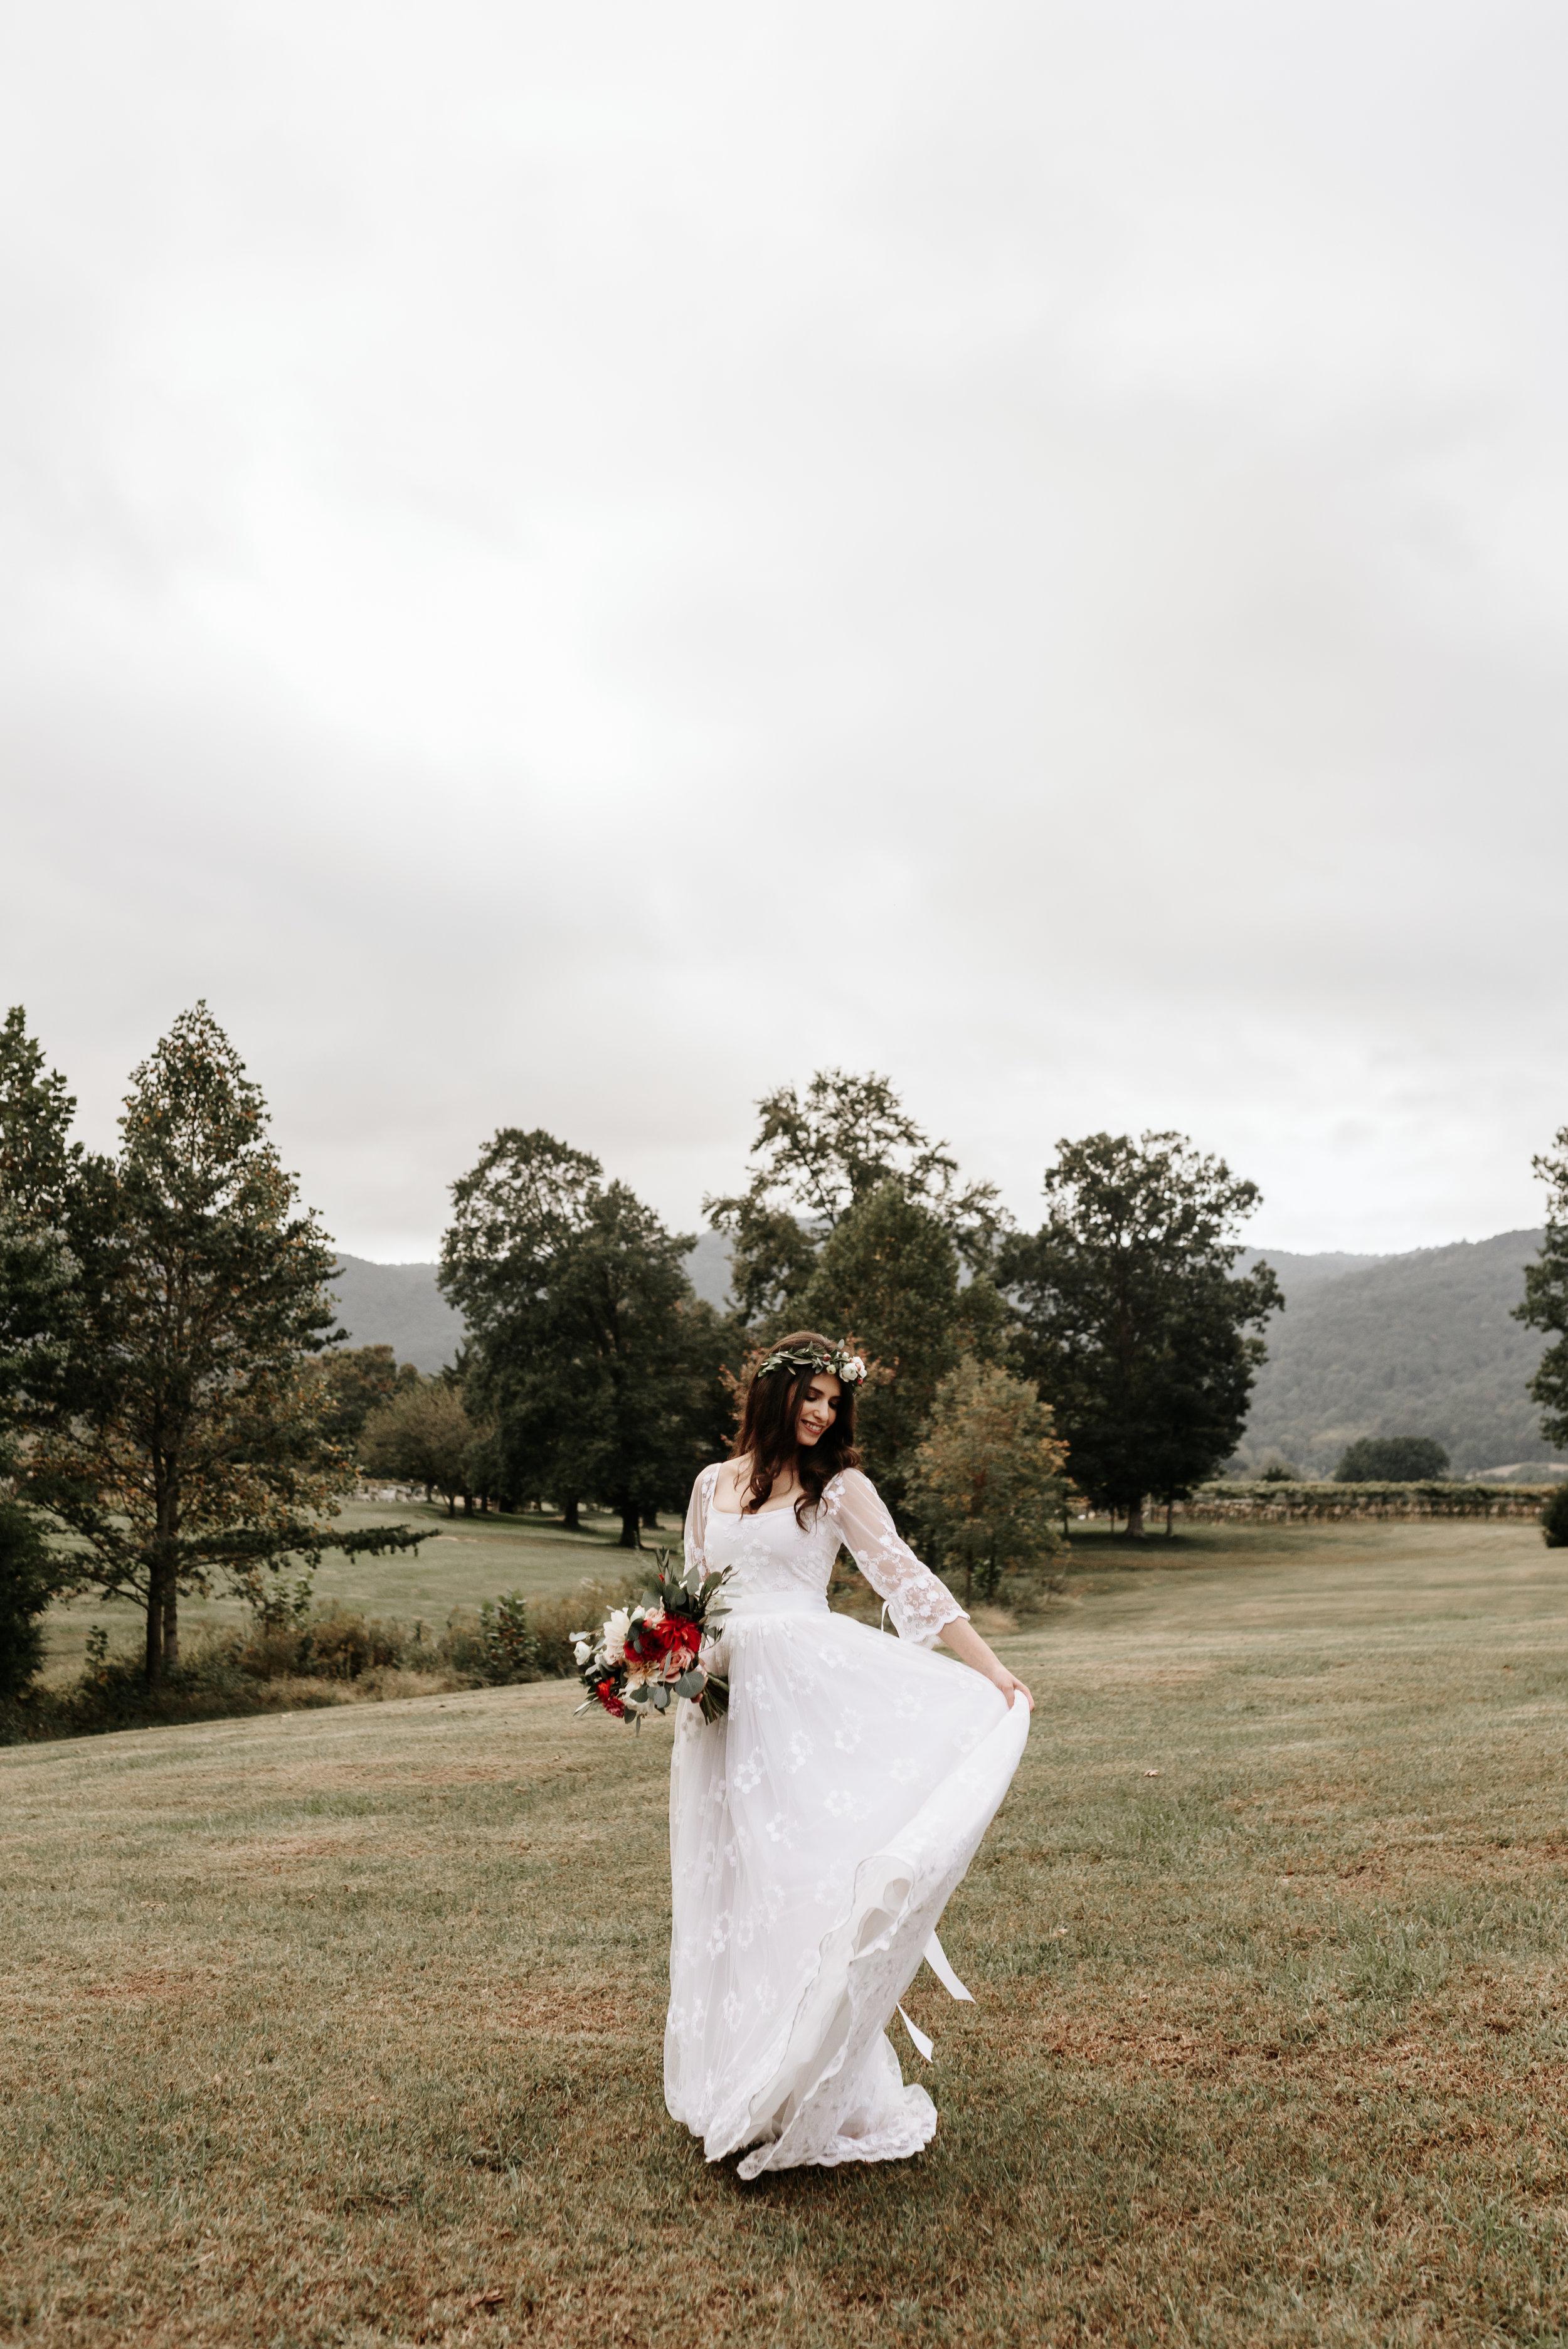 Veritas-Vineyards-and-Winery-Wedding-Photography-Afton-Virginia-Yasmin-Seth-Photography-by-V-9450.jpg